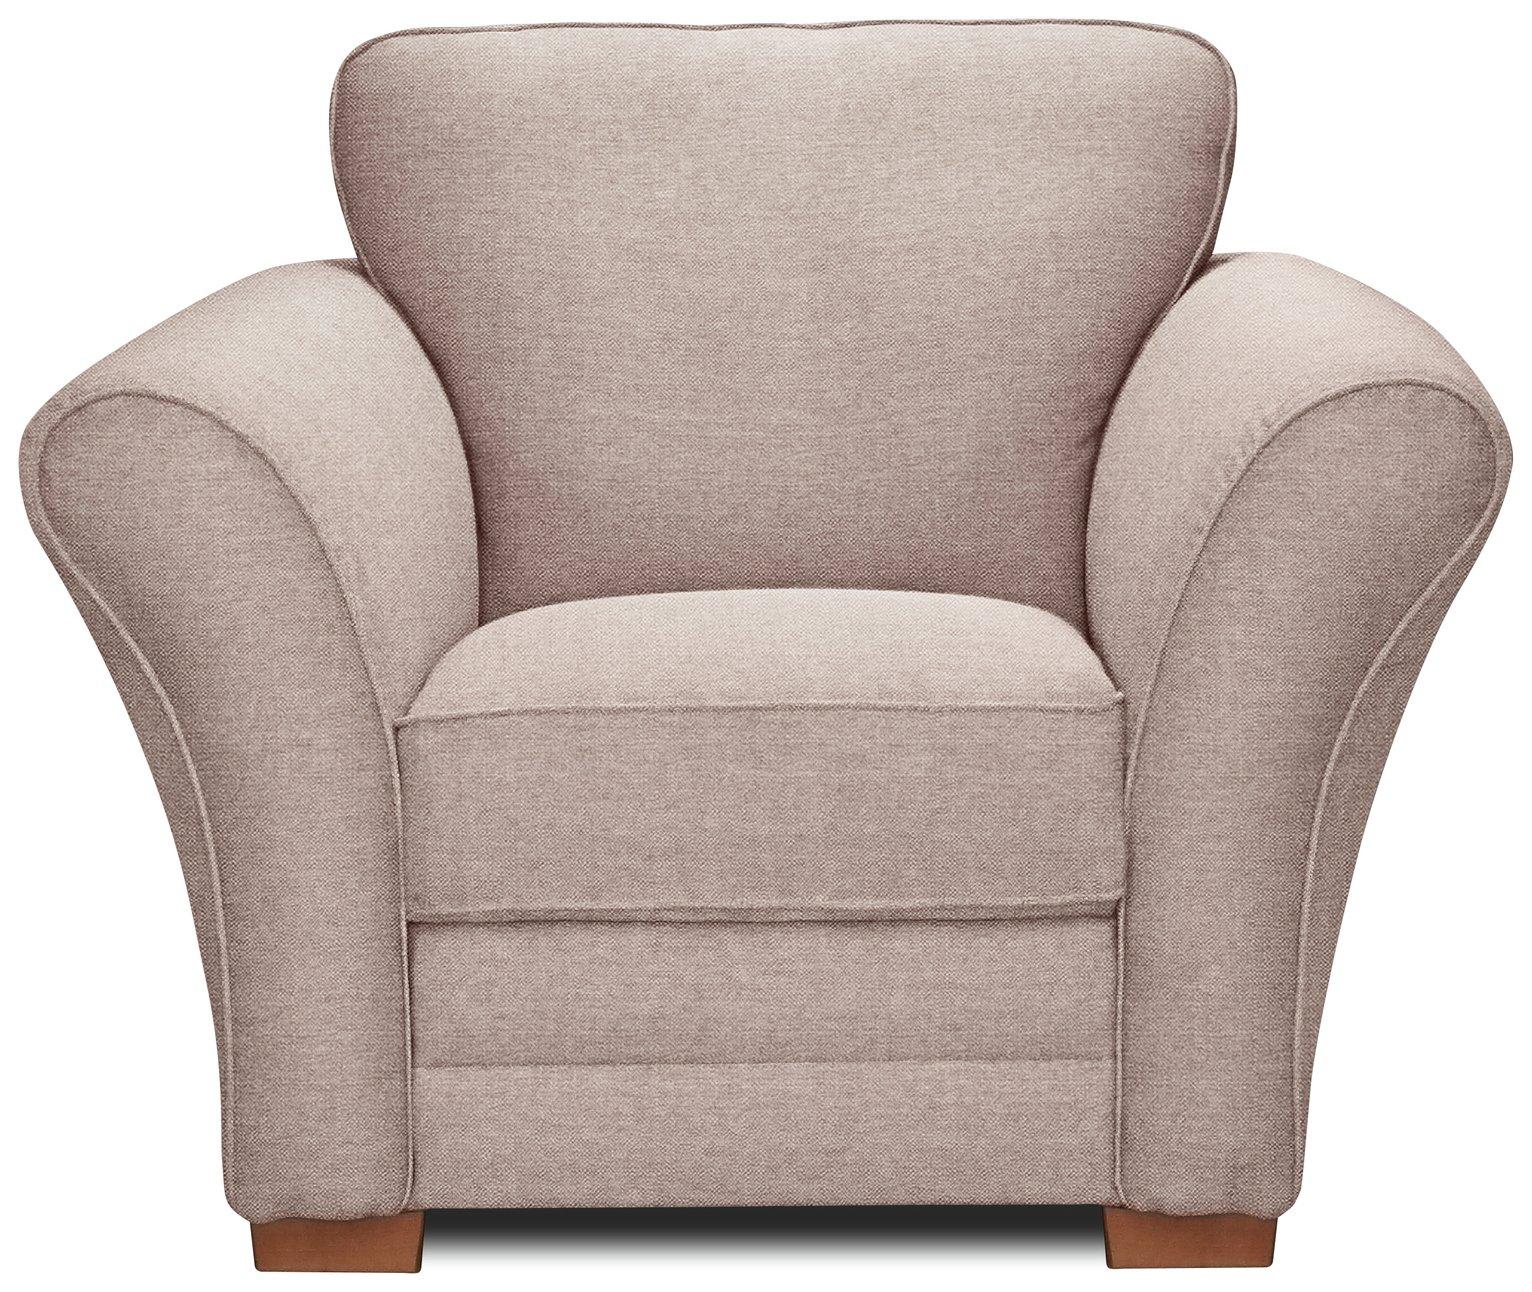 Argos Home New Thornton Fabric Armchair - Old Rose